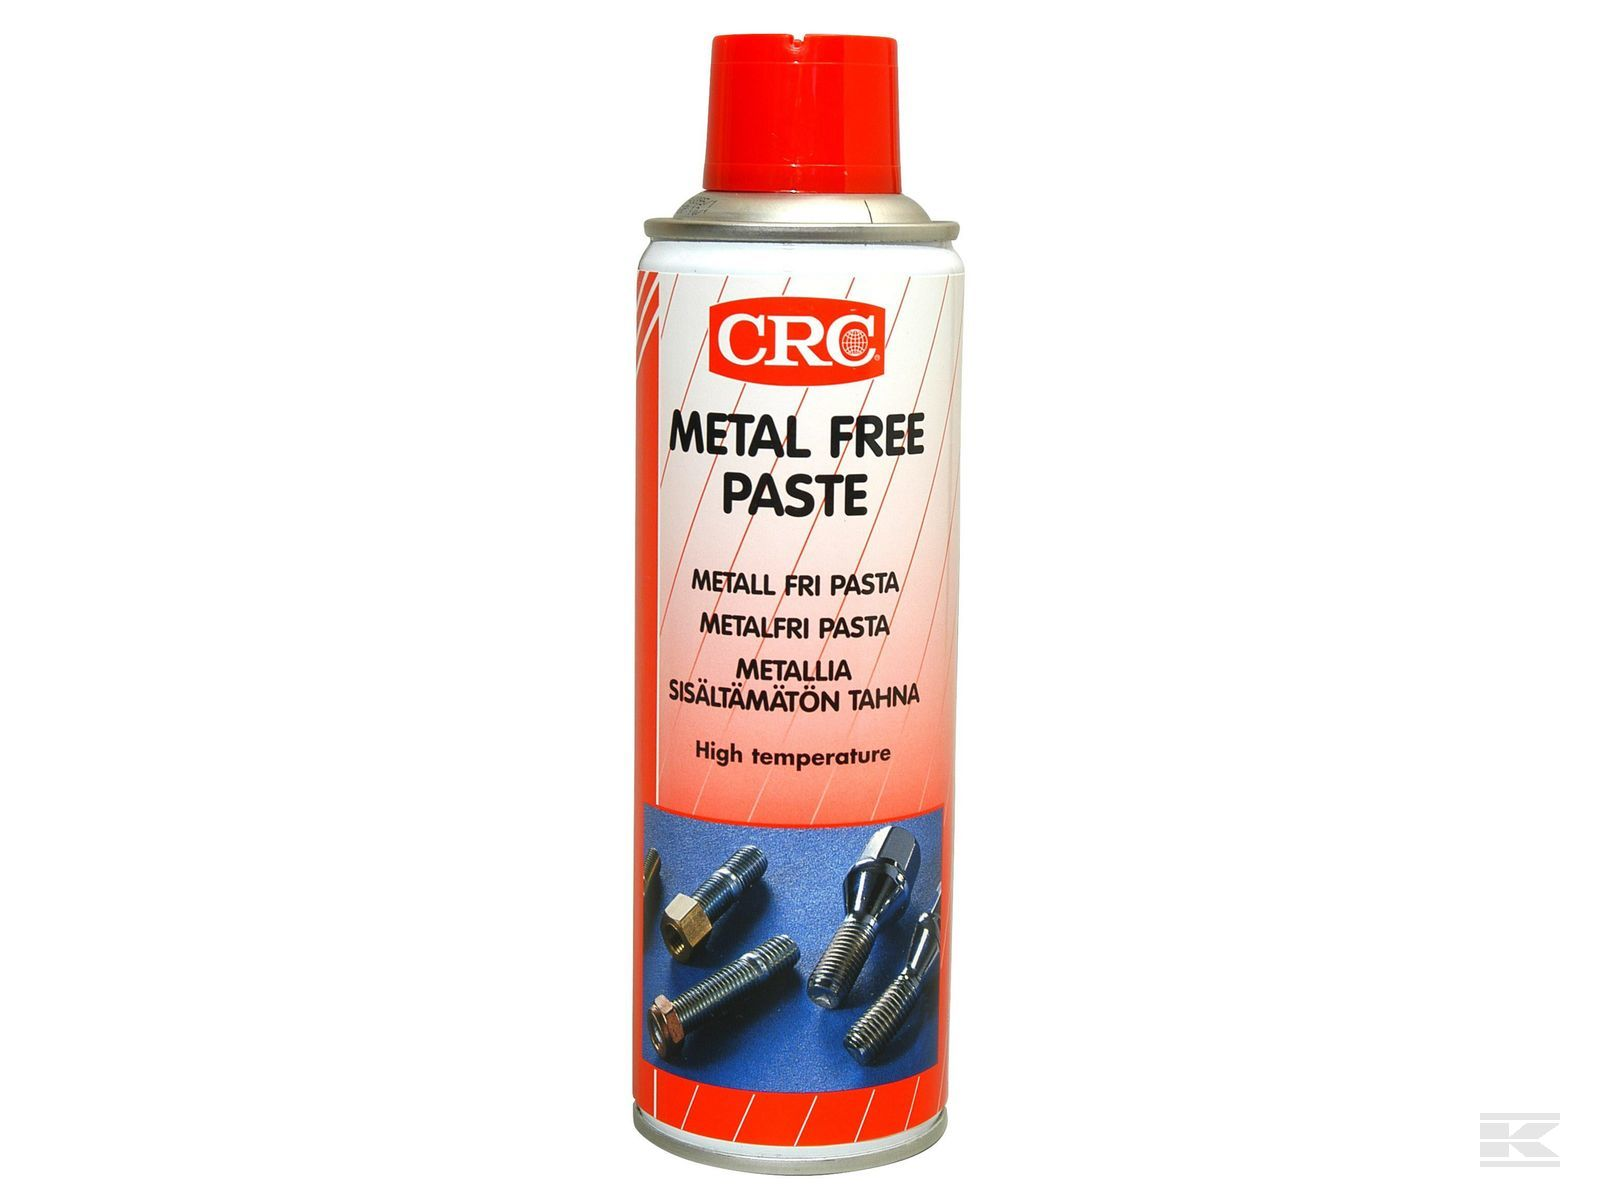 Afbeelding van crc automotive metal free paste 300 ml, spuitbus